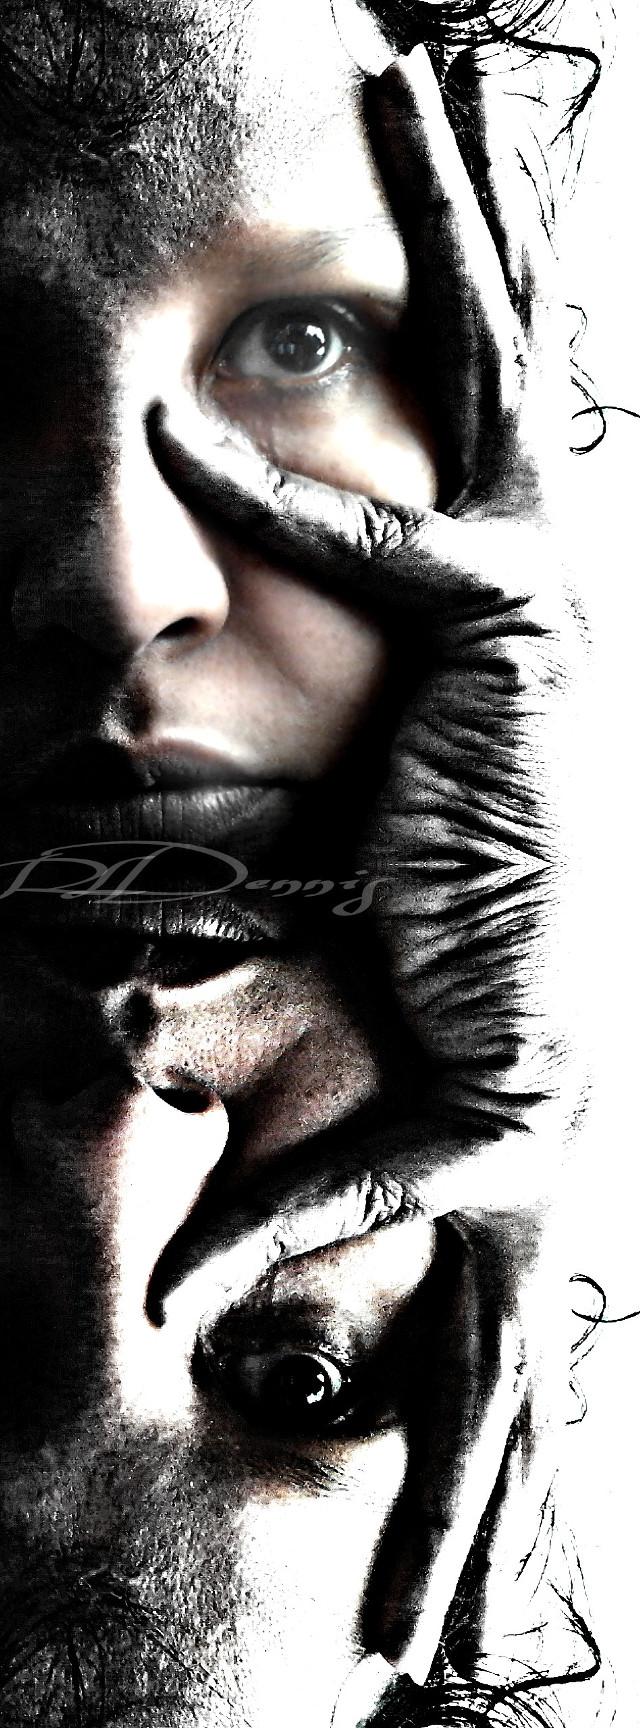 #blackandwhite #photography #artistic #artisticselfie #creativeselfie #darkselfie #me   The darkside of Me I only haunt at night